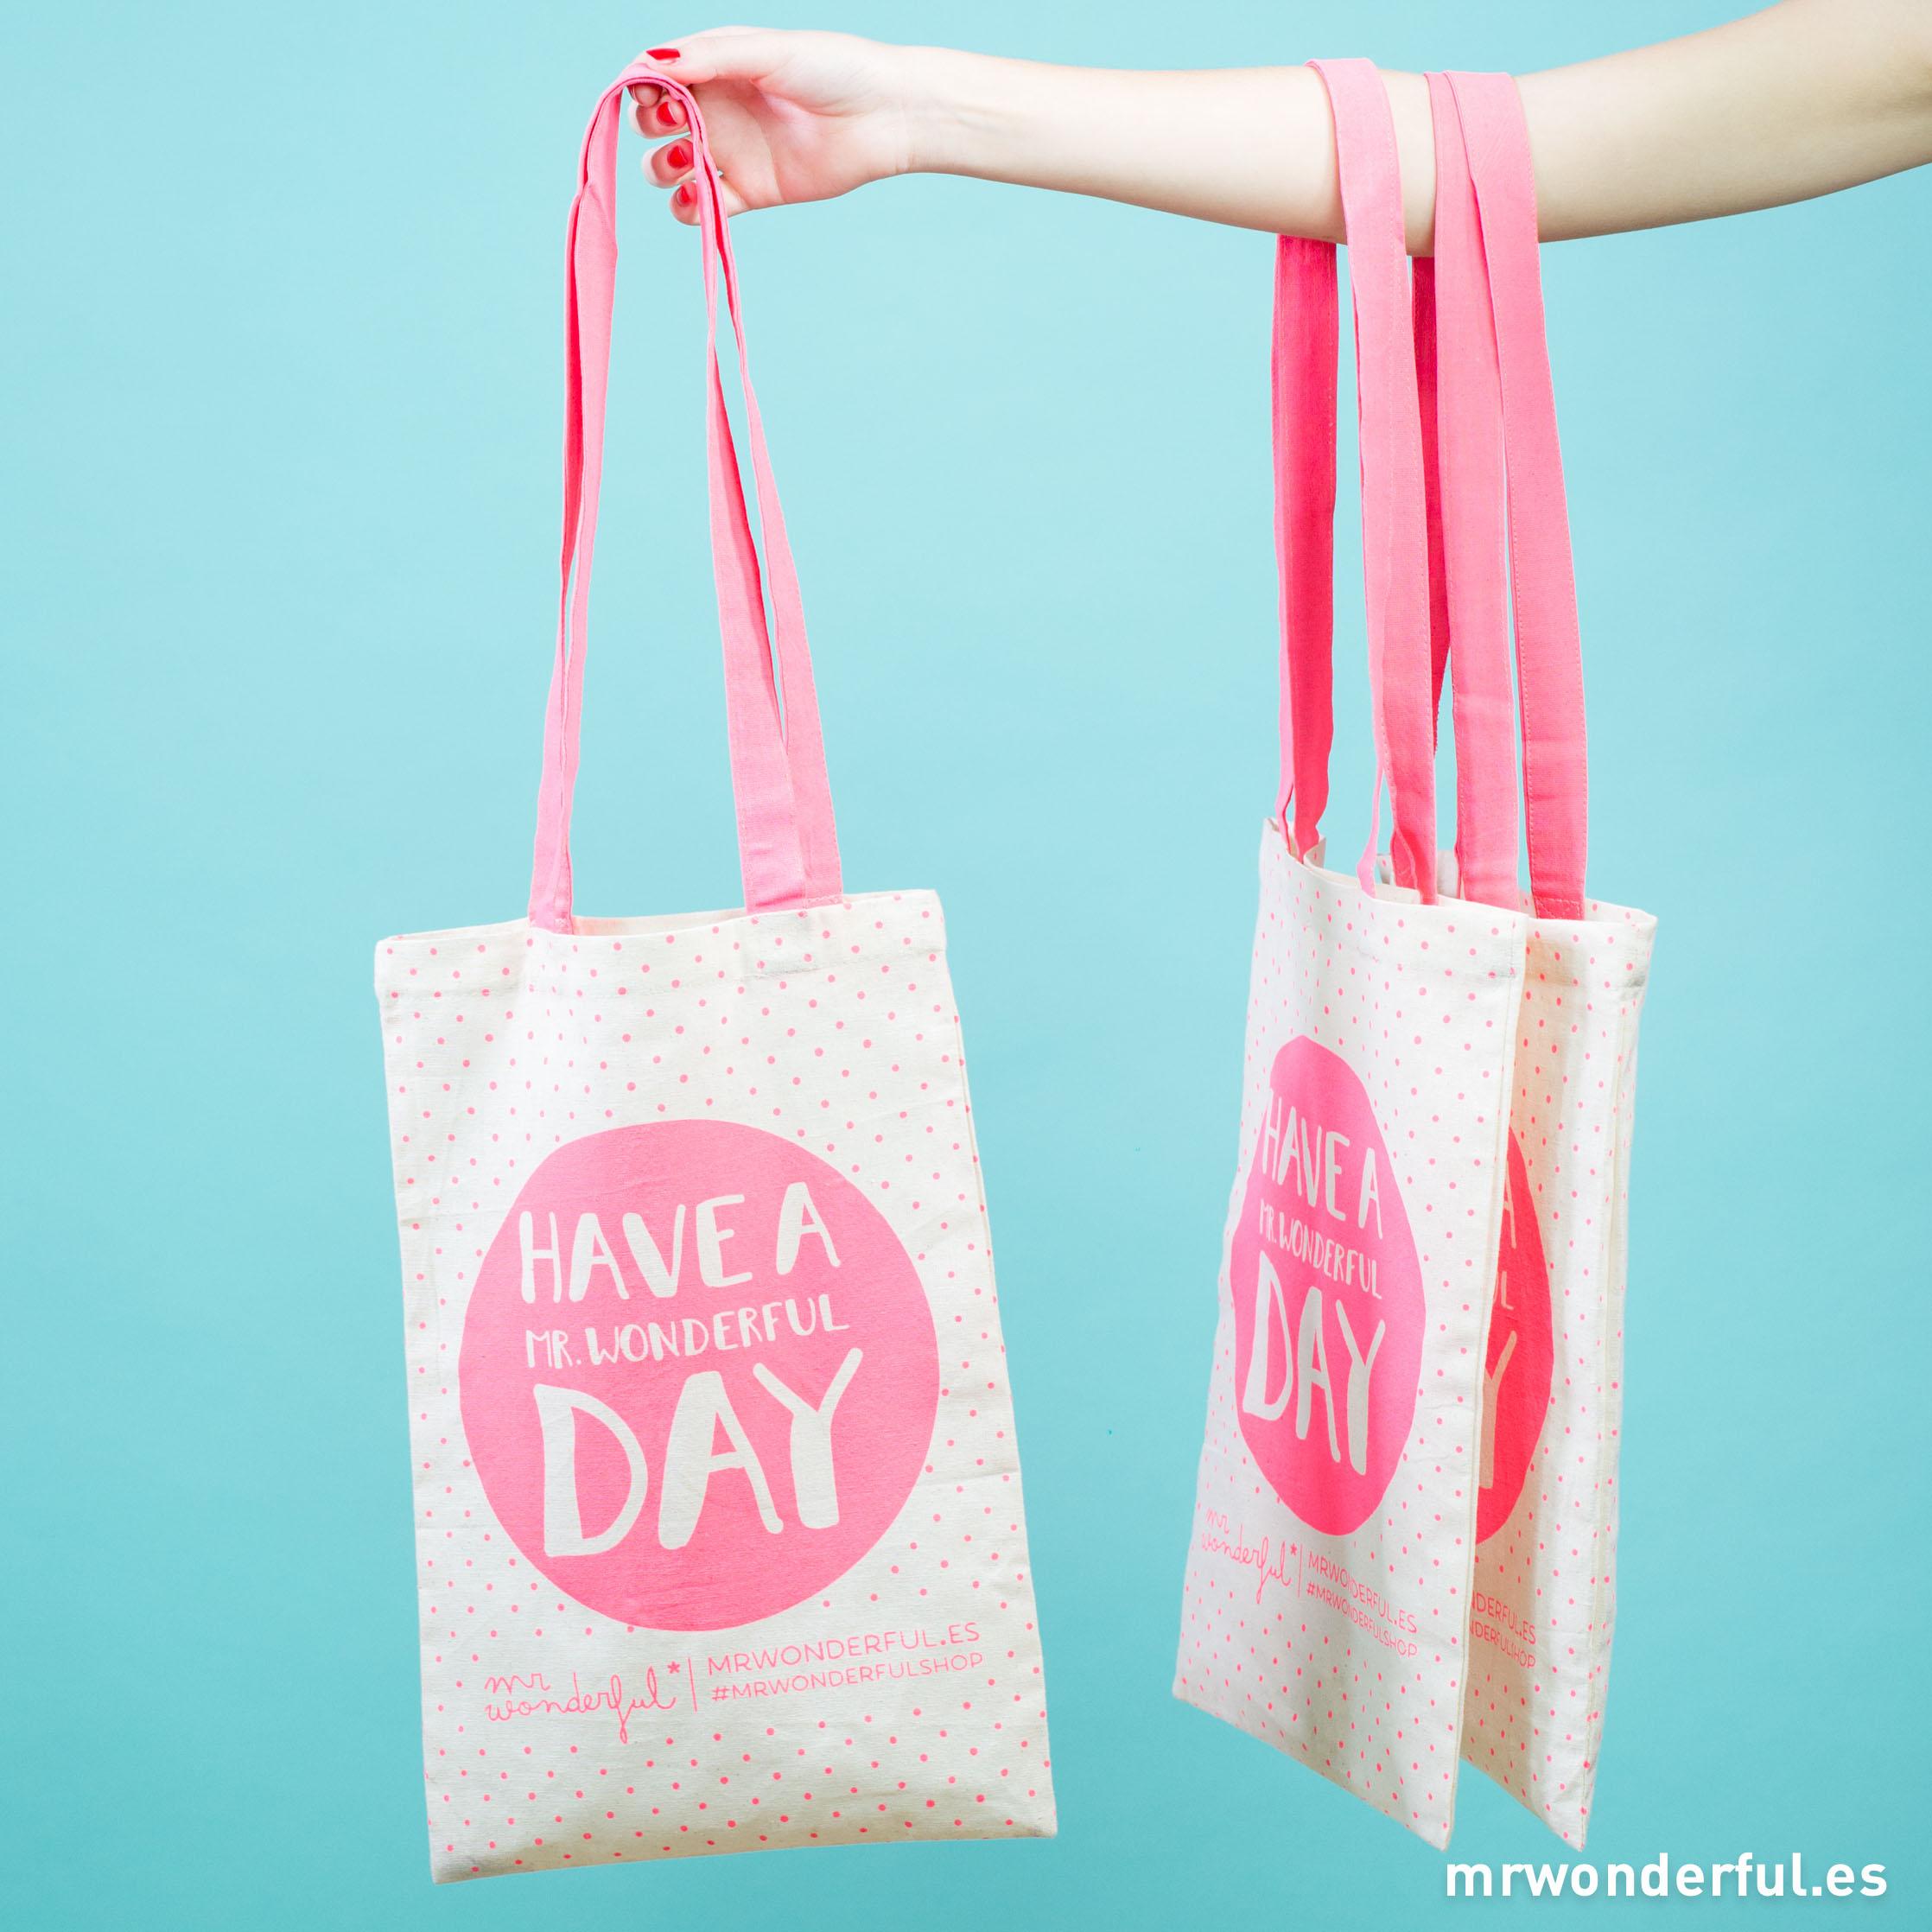 mrwonderful_tote-bags-fucsia-169